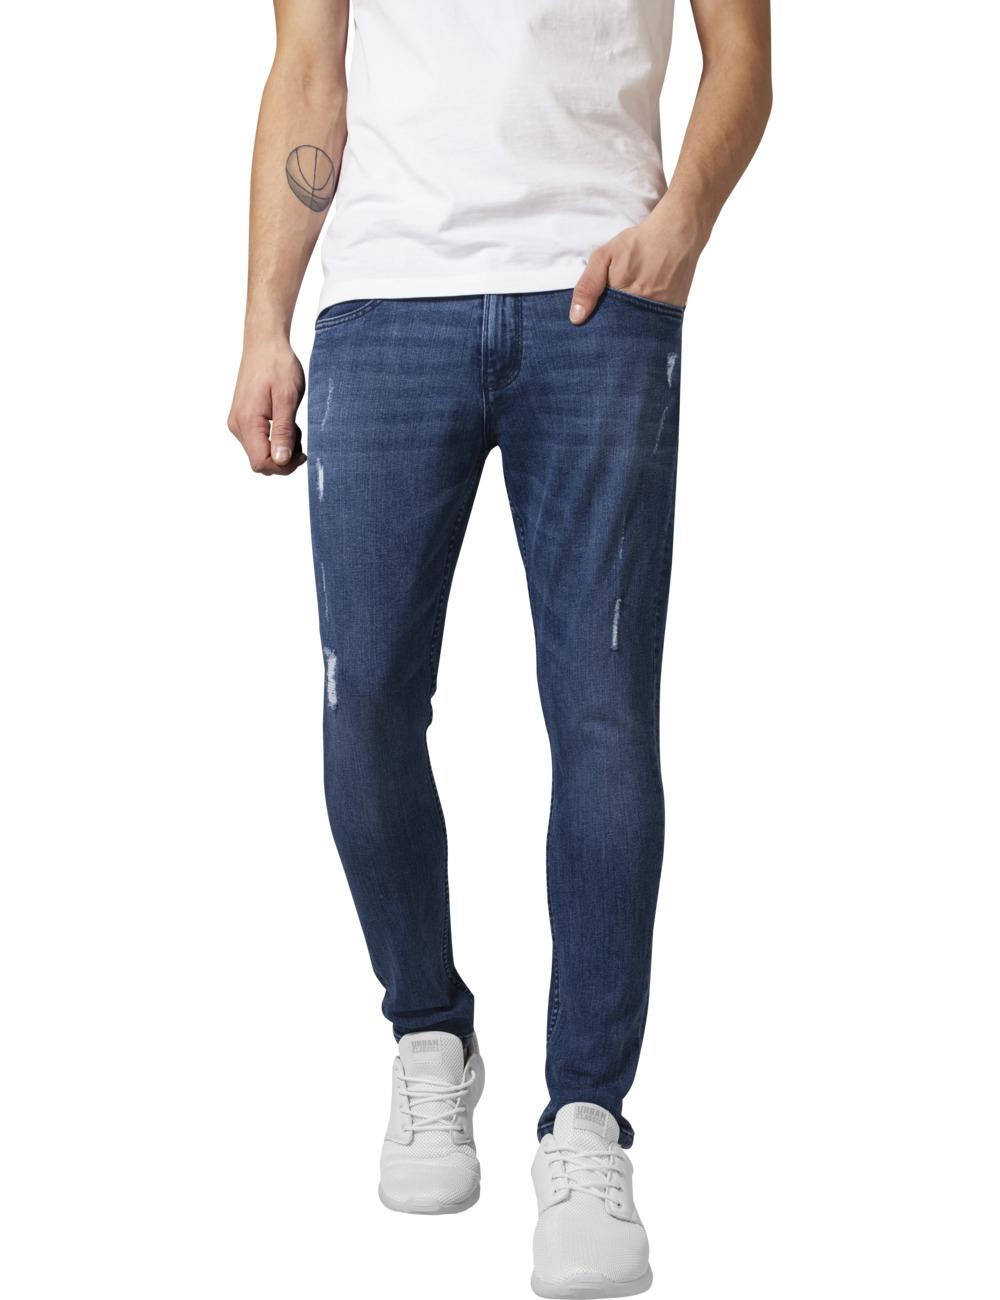 urban classics herren jeans skinny ripped stretch skinny fit kaufen jeans direct de. Black Bedroom Furniture Sets. Home Design Ideas